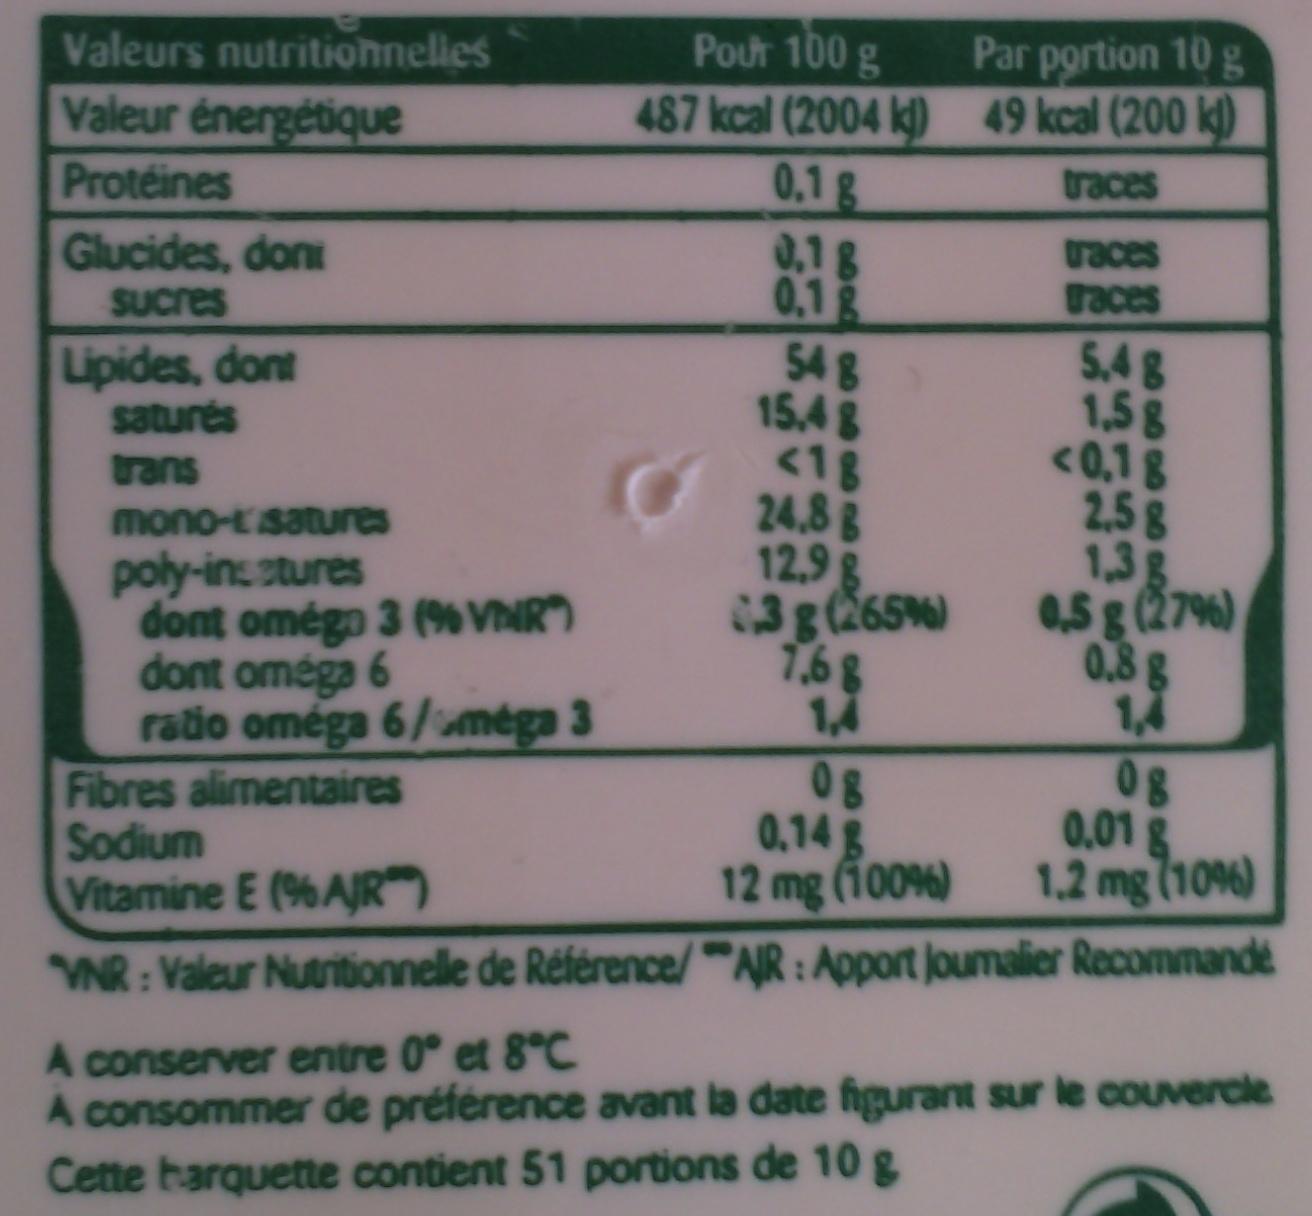 St Hubert Oméga 3 (Doux, Tartine et Cuisson), (54 % MG) - Nutrition facts